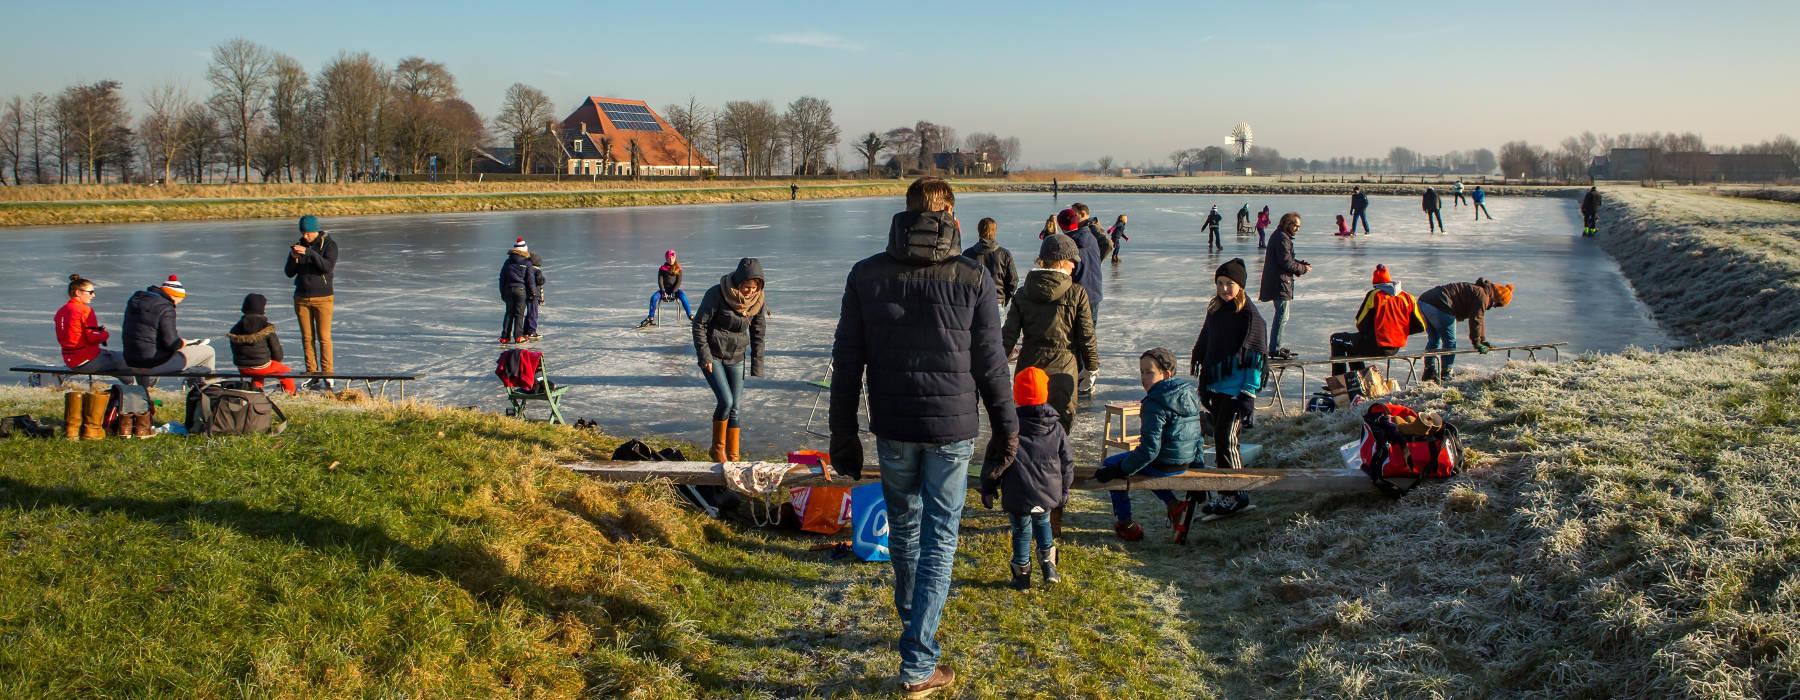 FNP nijs algemien 5 winter